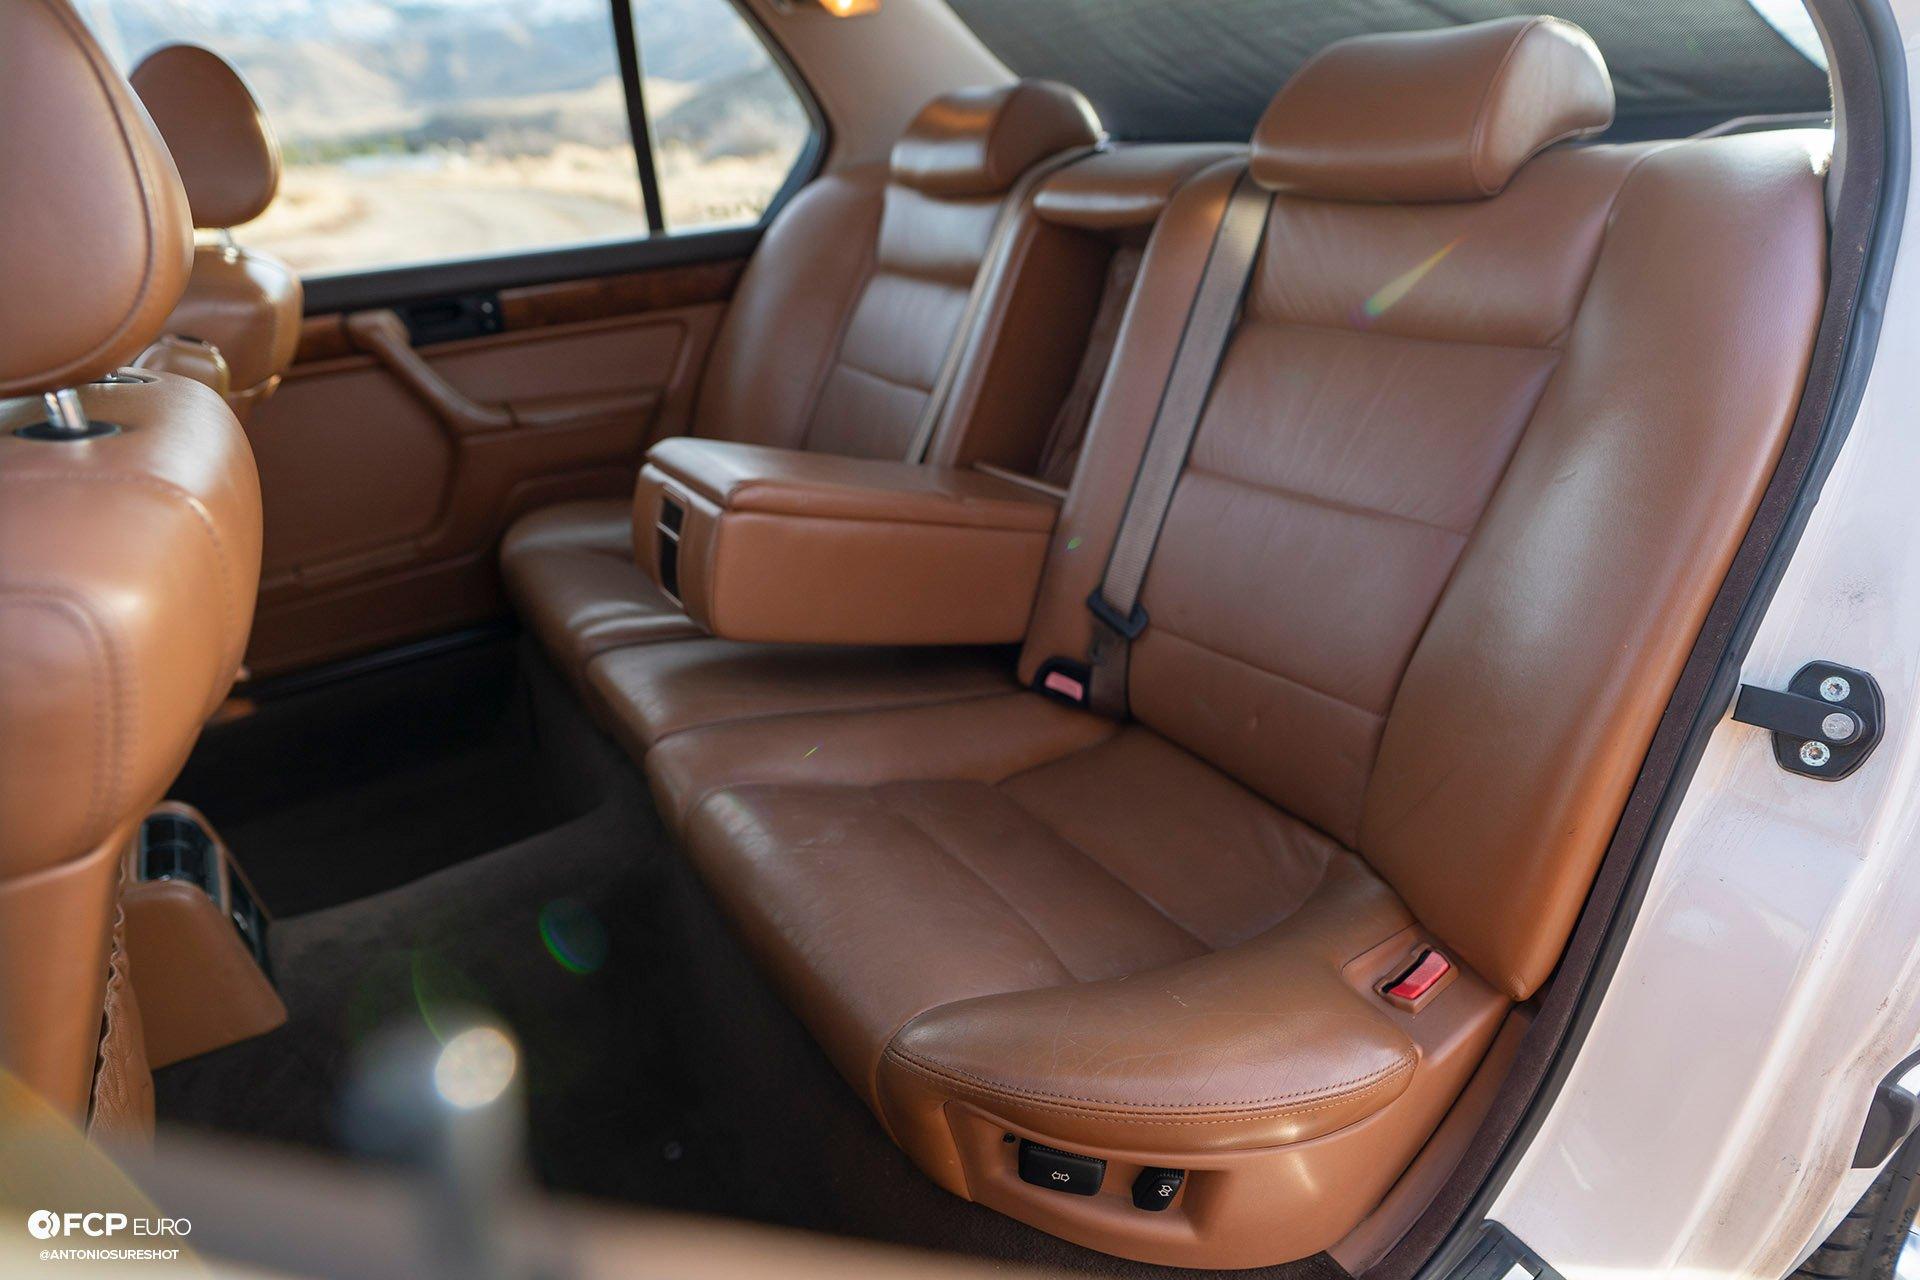 BMW E32 750iL 6 speed A9A02548